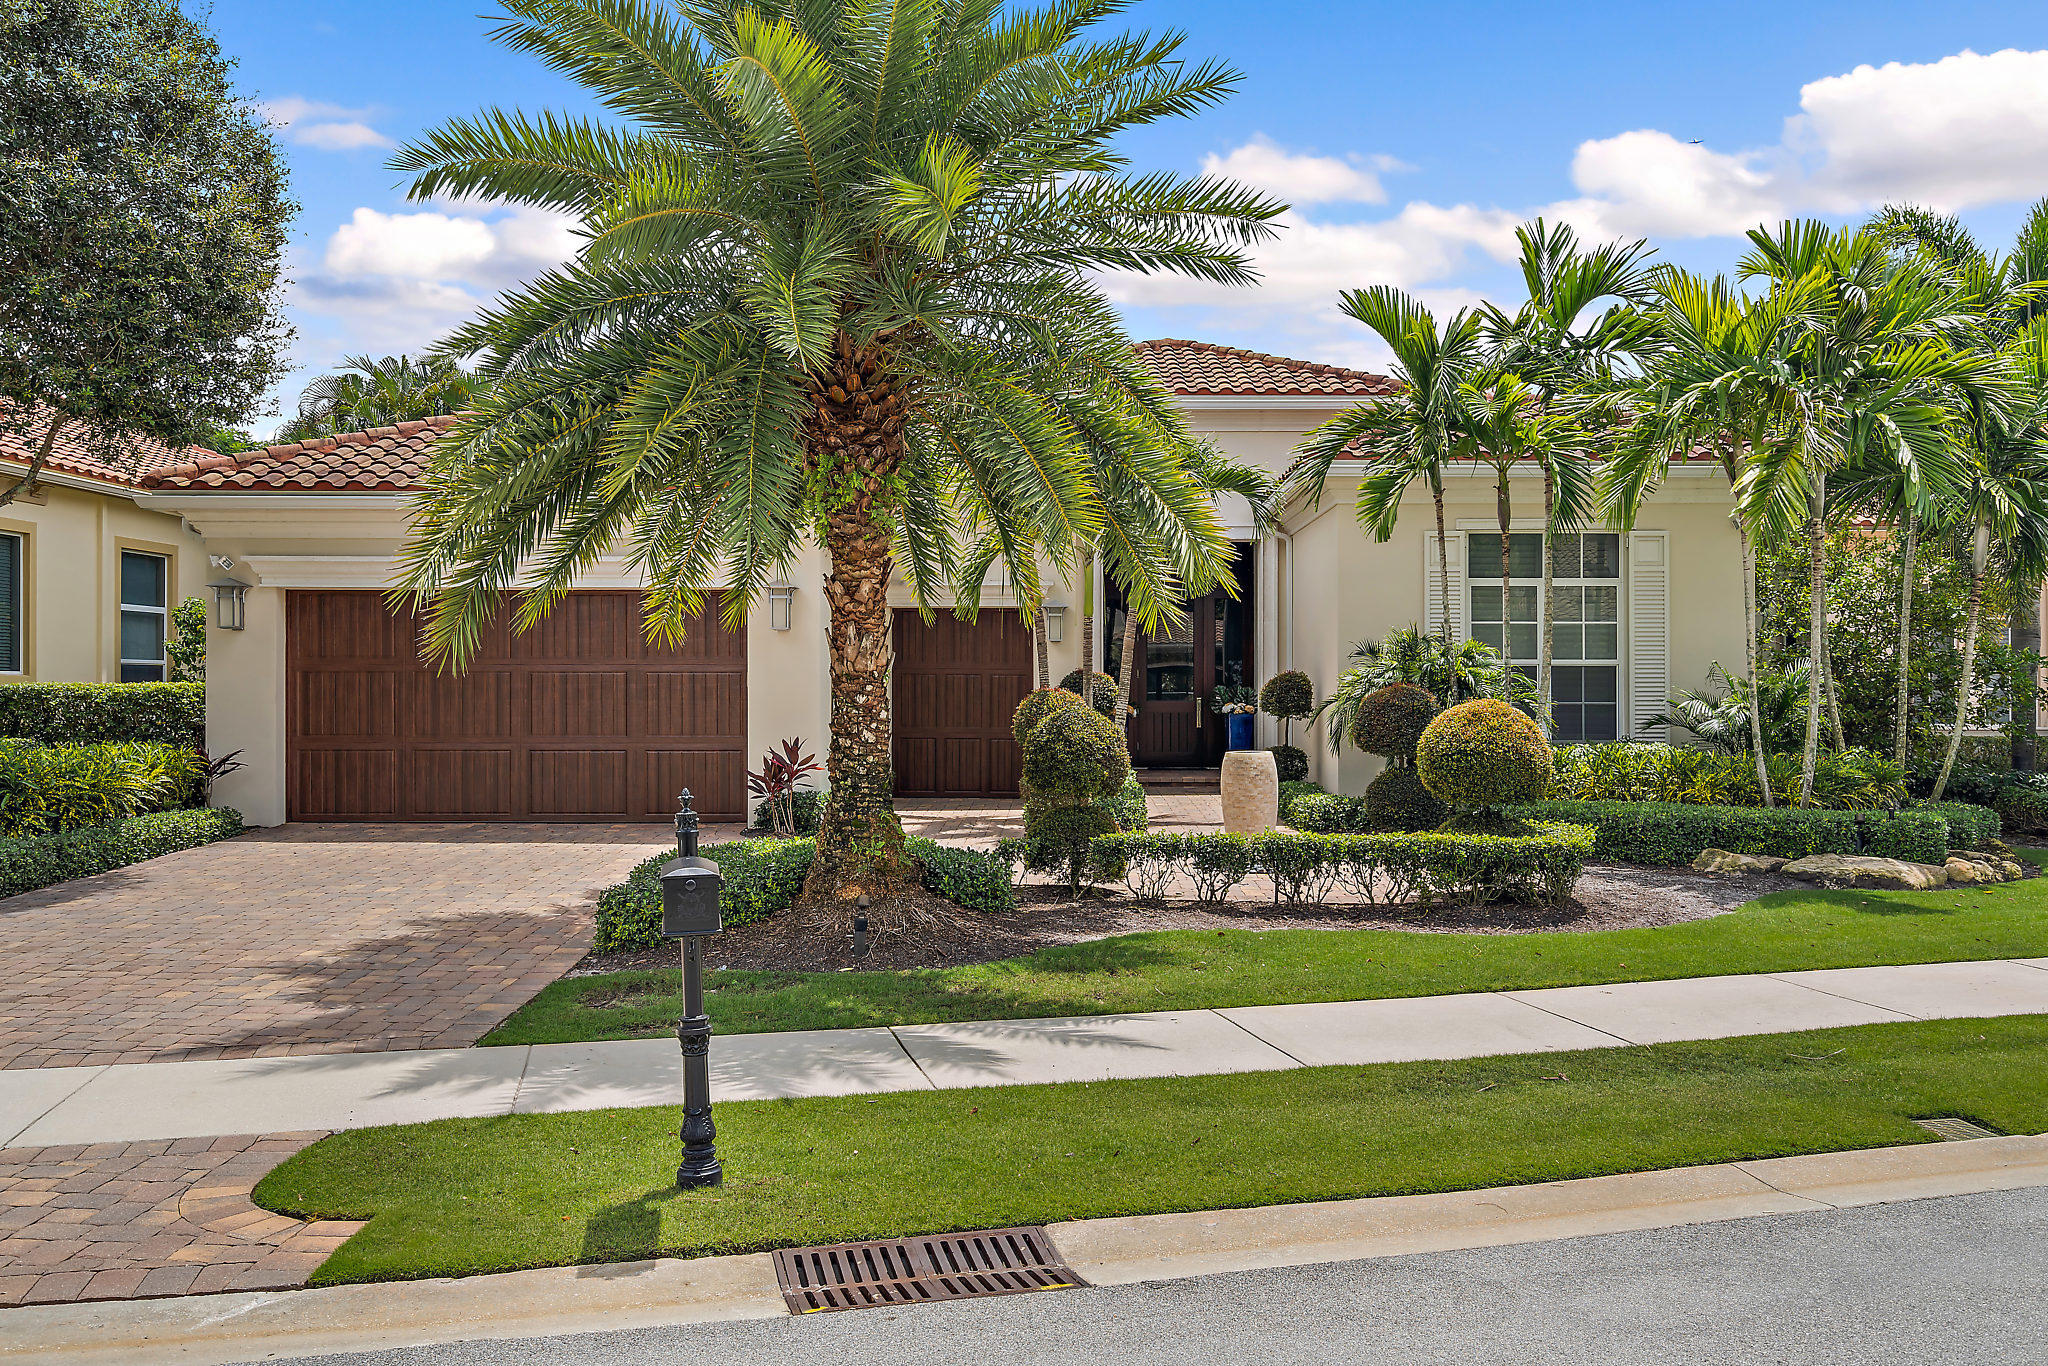 11410 Pink Oleander Lane, Palm Beach Gardens, Florida 33418, 3 Bedrooms Bedrooms, ,3.1 BathroomsBathrooms,A,Single family,Pink Oleander,RX-10554645